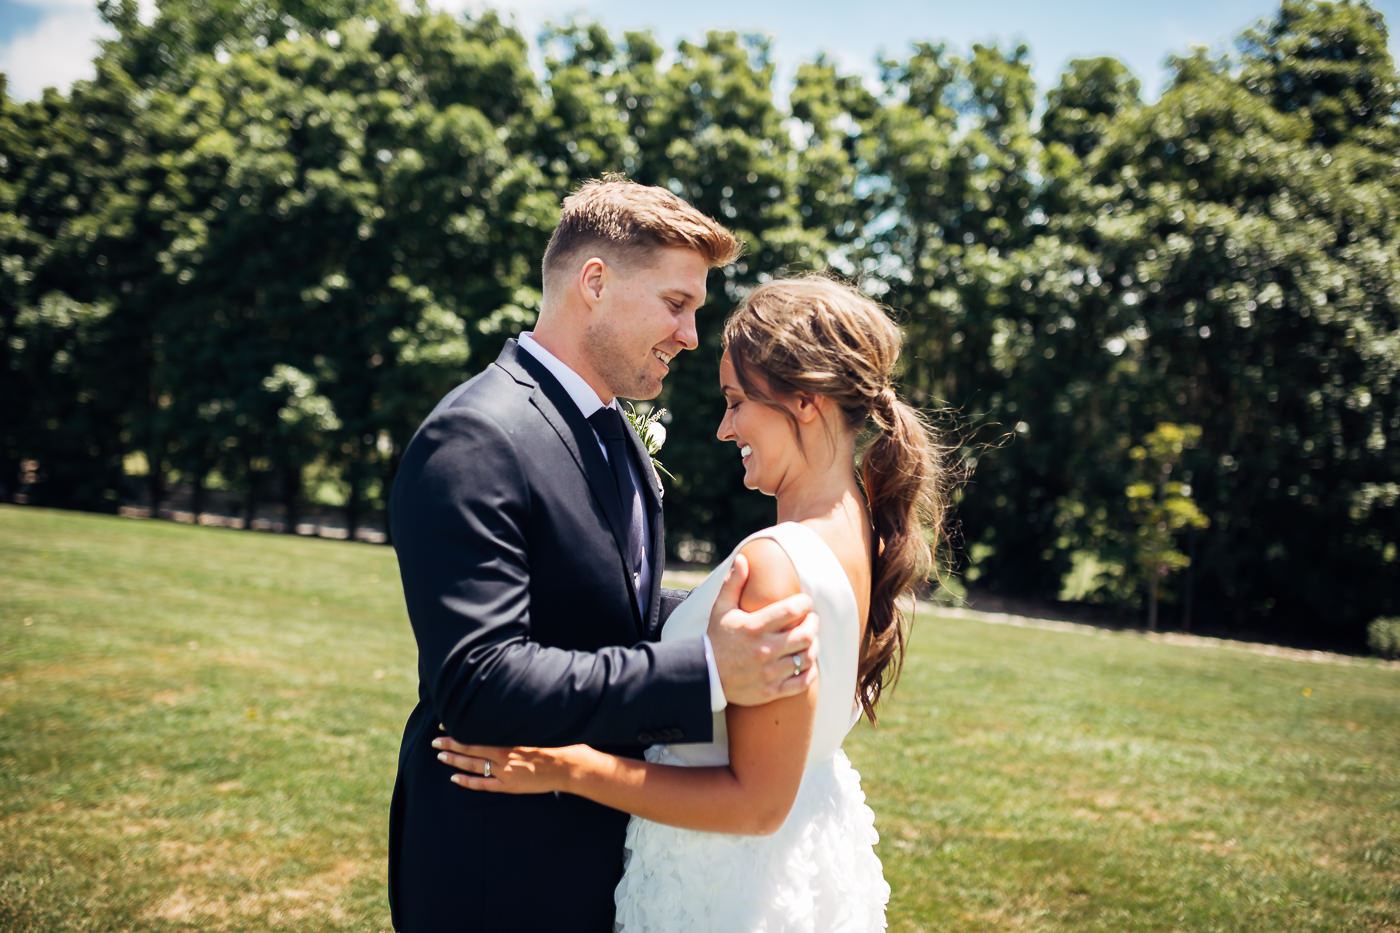 Anne-Hilde & Pieter - januarbryllup i slående vakre Tauranga, New Zealand Bryllupsfotograf New Zealand strand 28 Brudepar